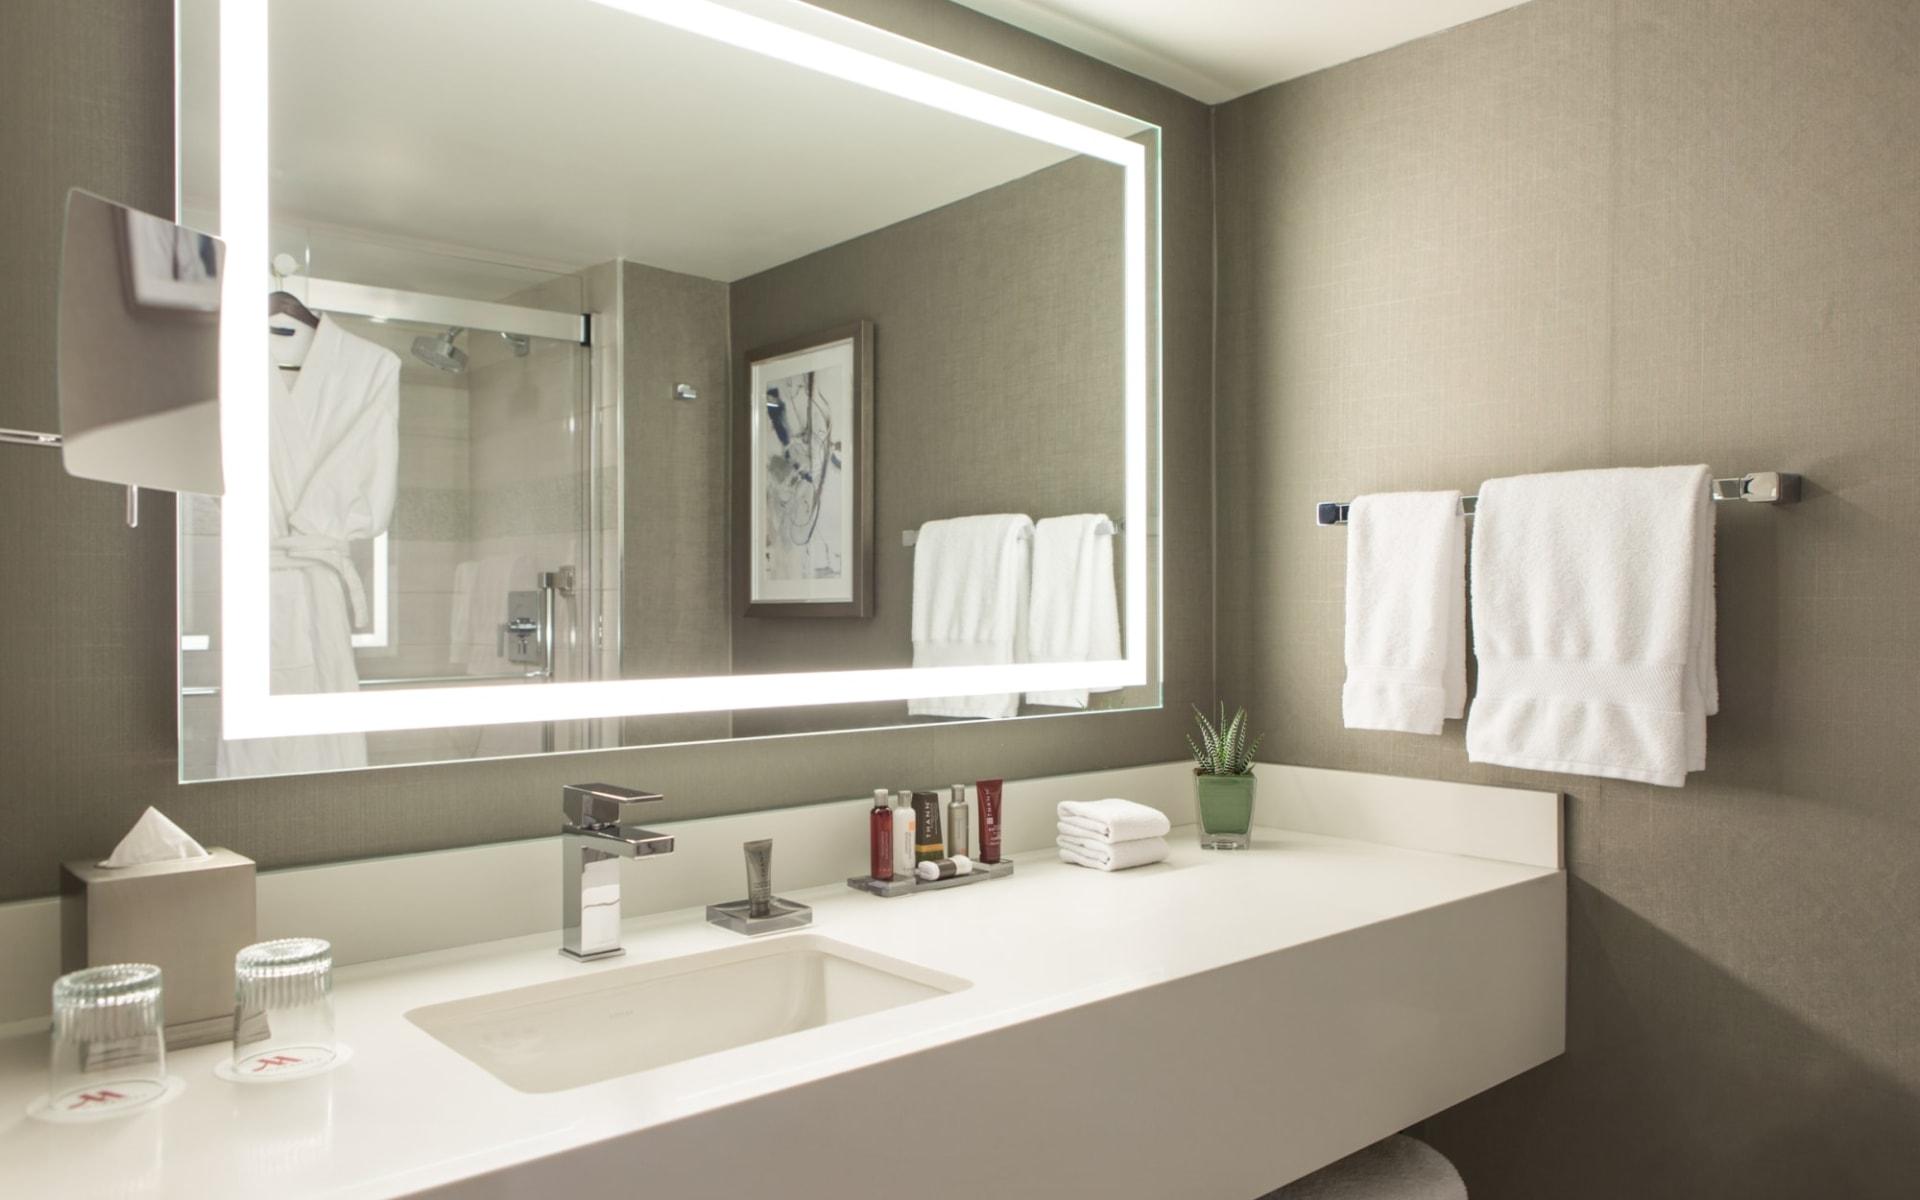 Calgary Marriott Hotel:  Calgary Marriott Hotel_Bathroom